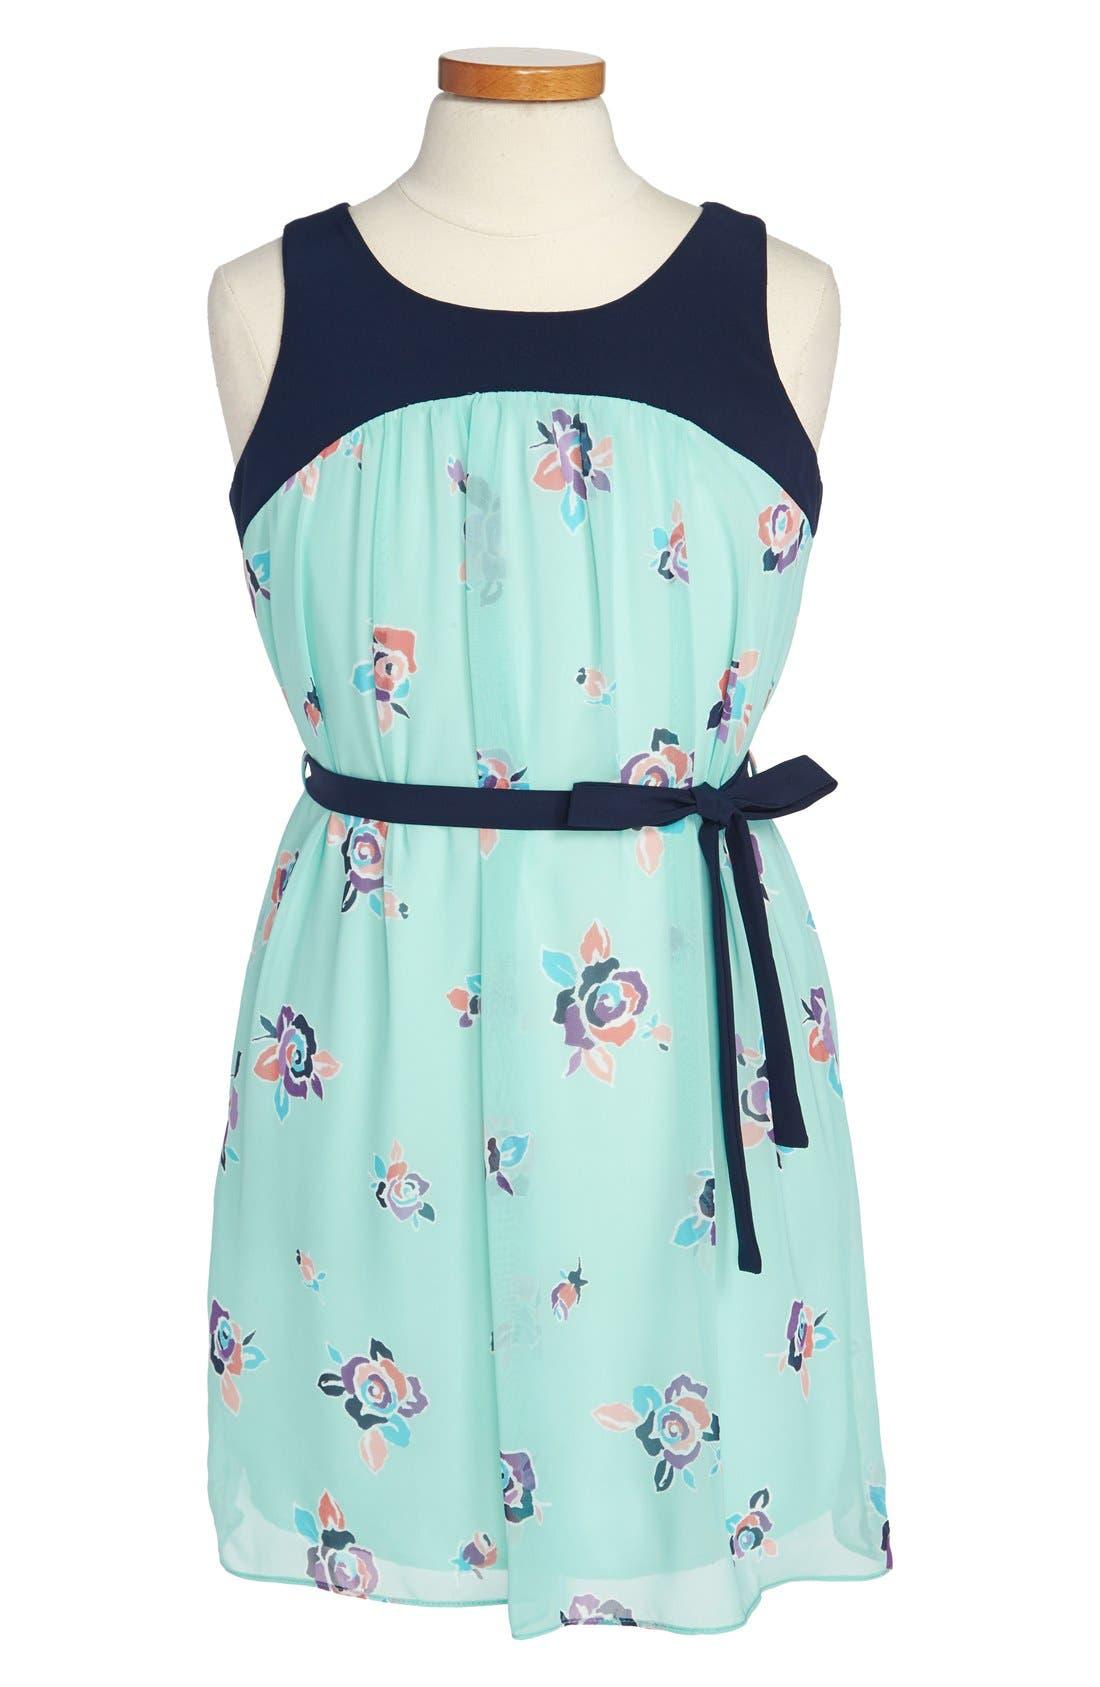 Alternate Image 1 Selected - Soprano Floral Chiffon Dress (Big Girls)